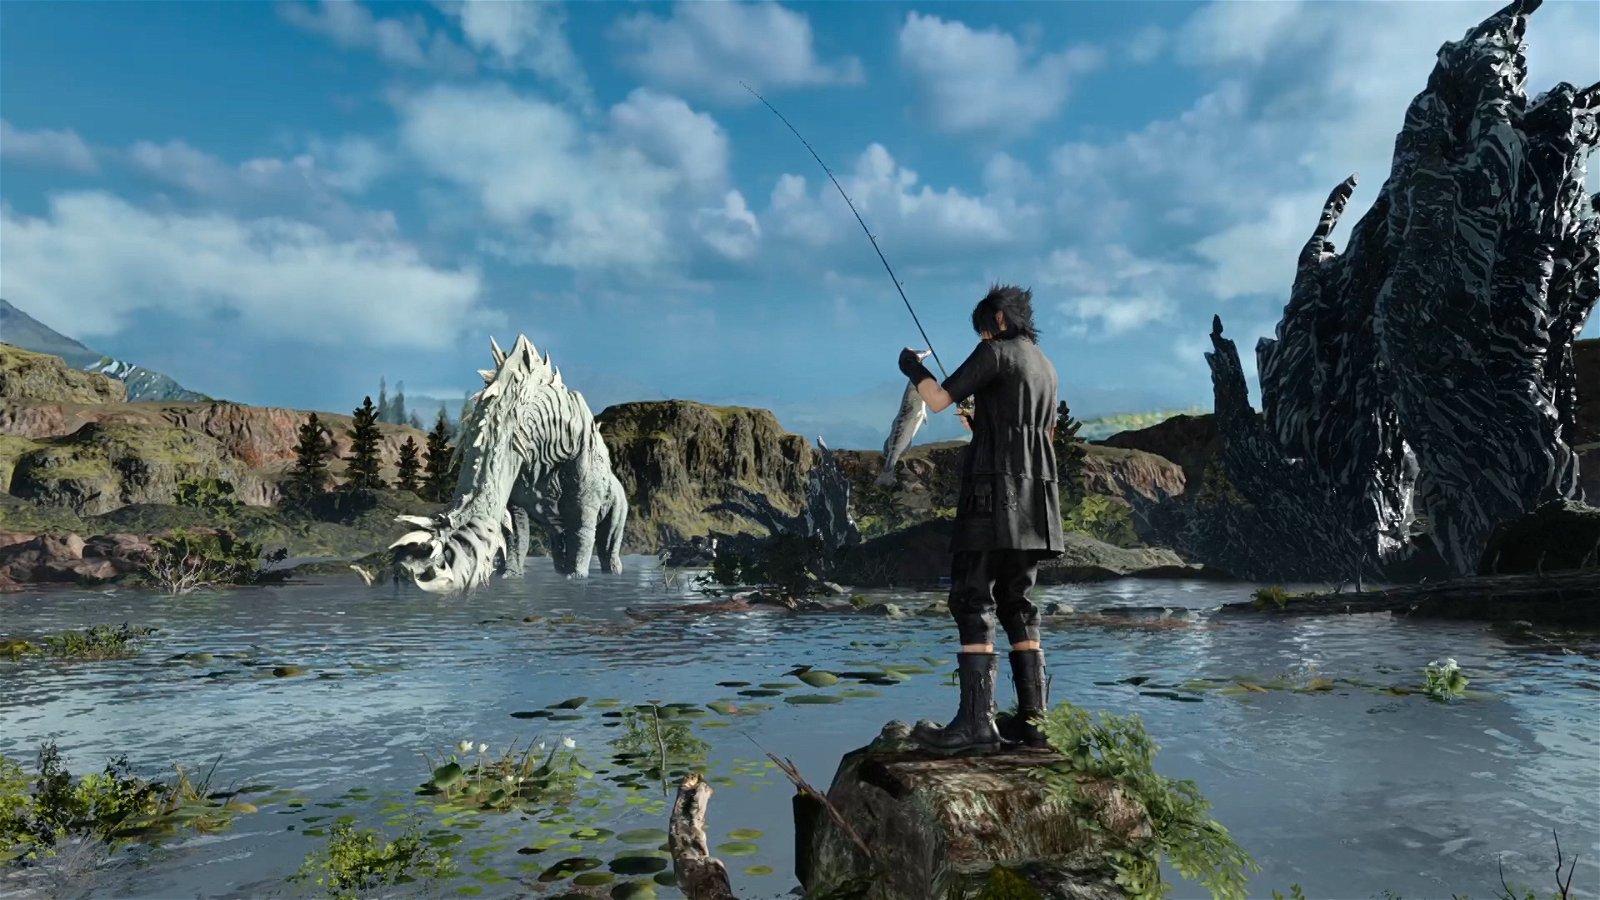 Monster of the Deep: Final Fantasy XV (PSVR) Review: Not-So-Deep Fishing Sim